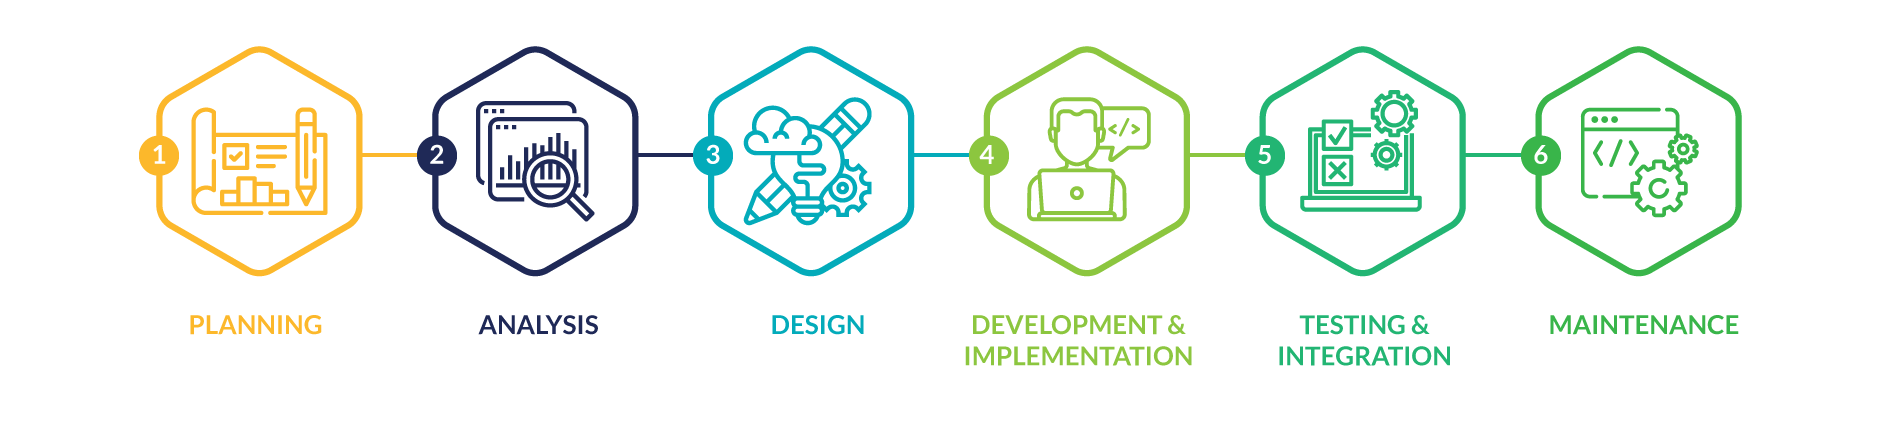 7EDGE web application development process icons